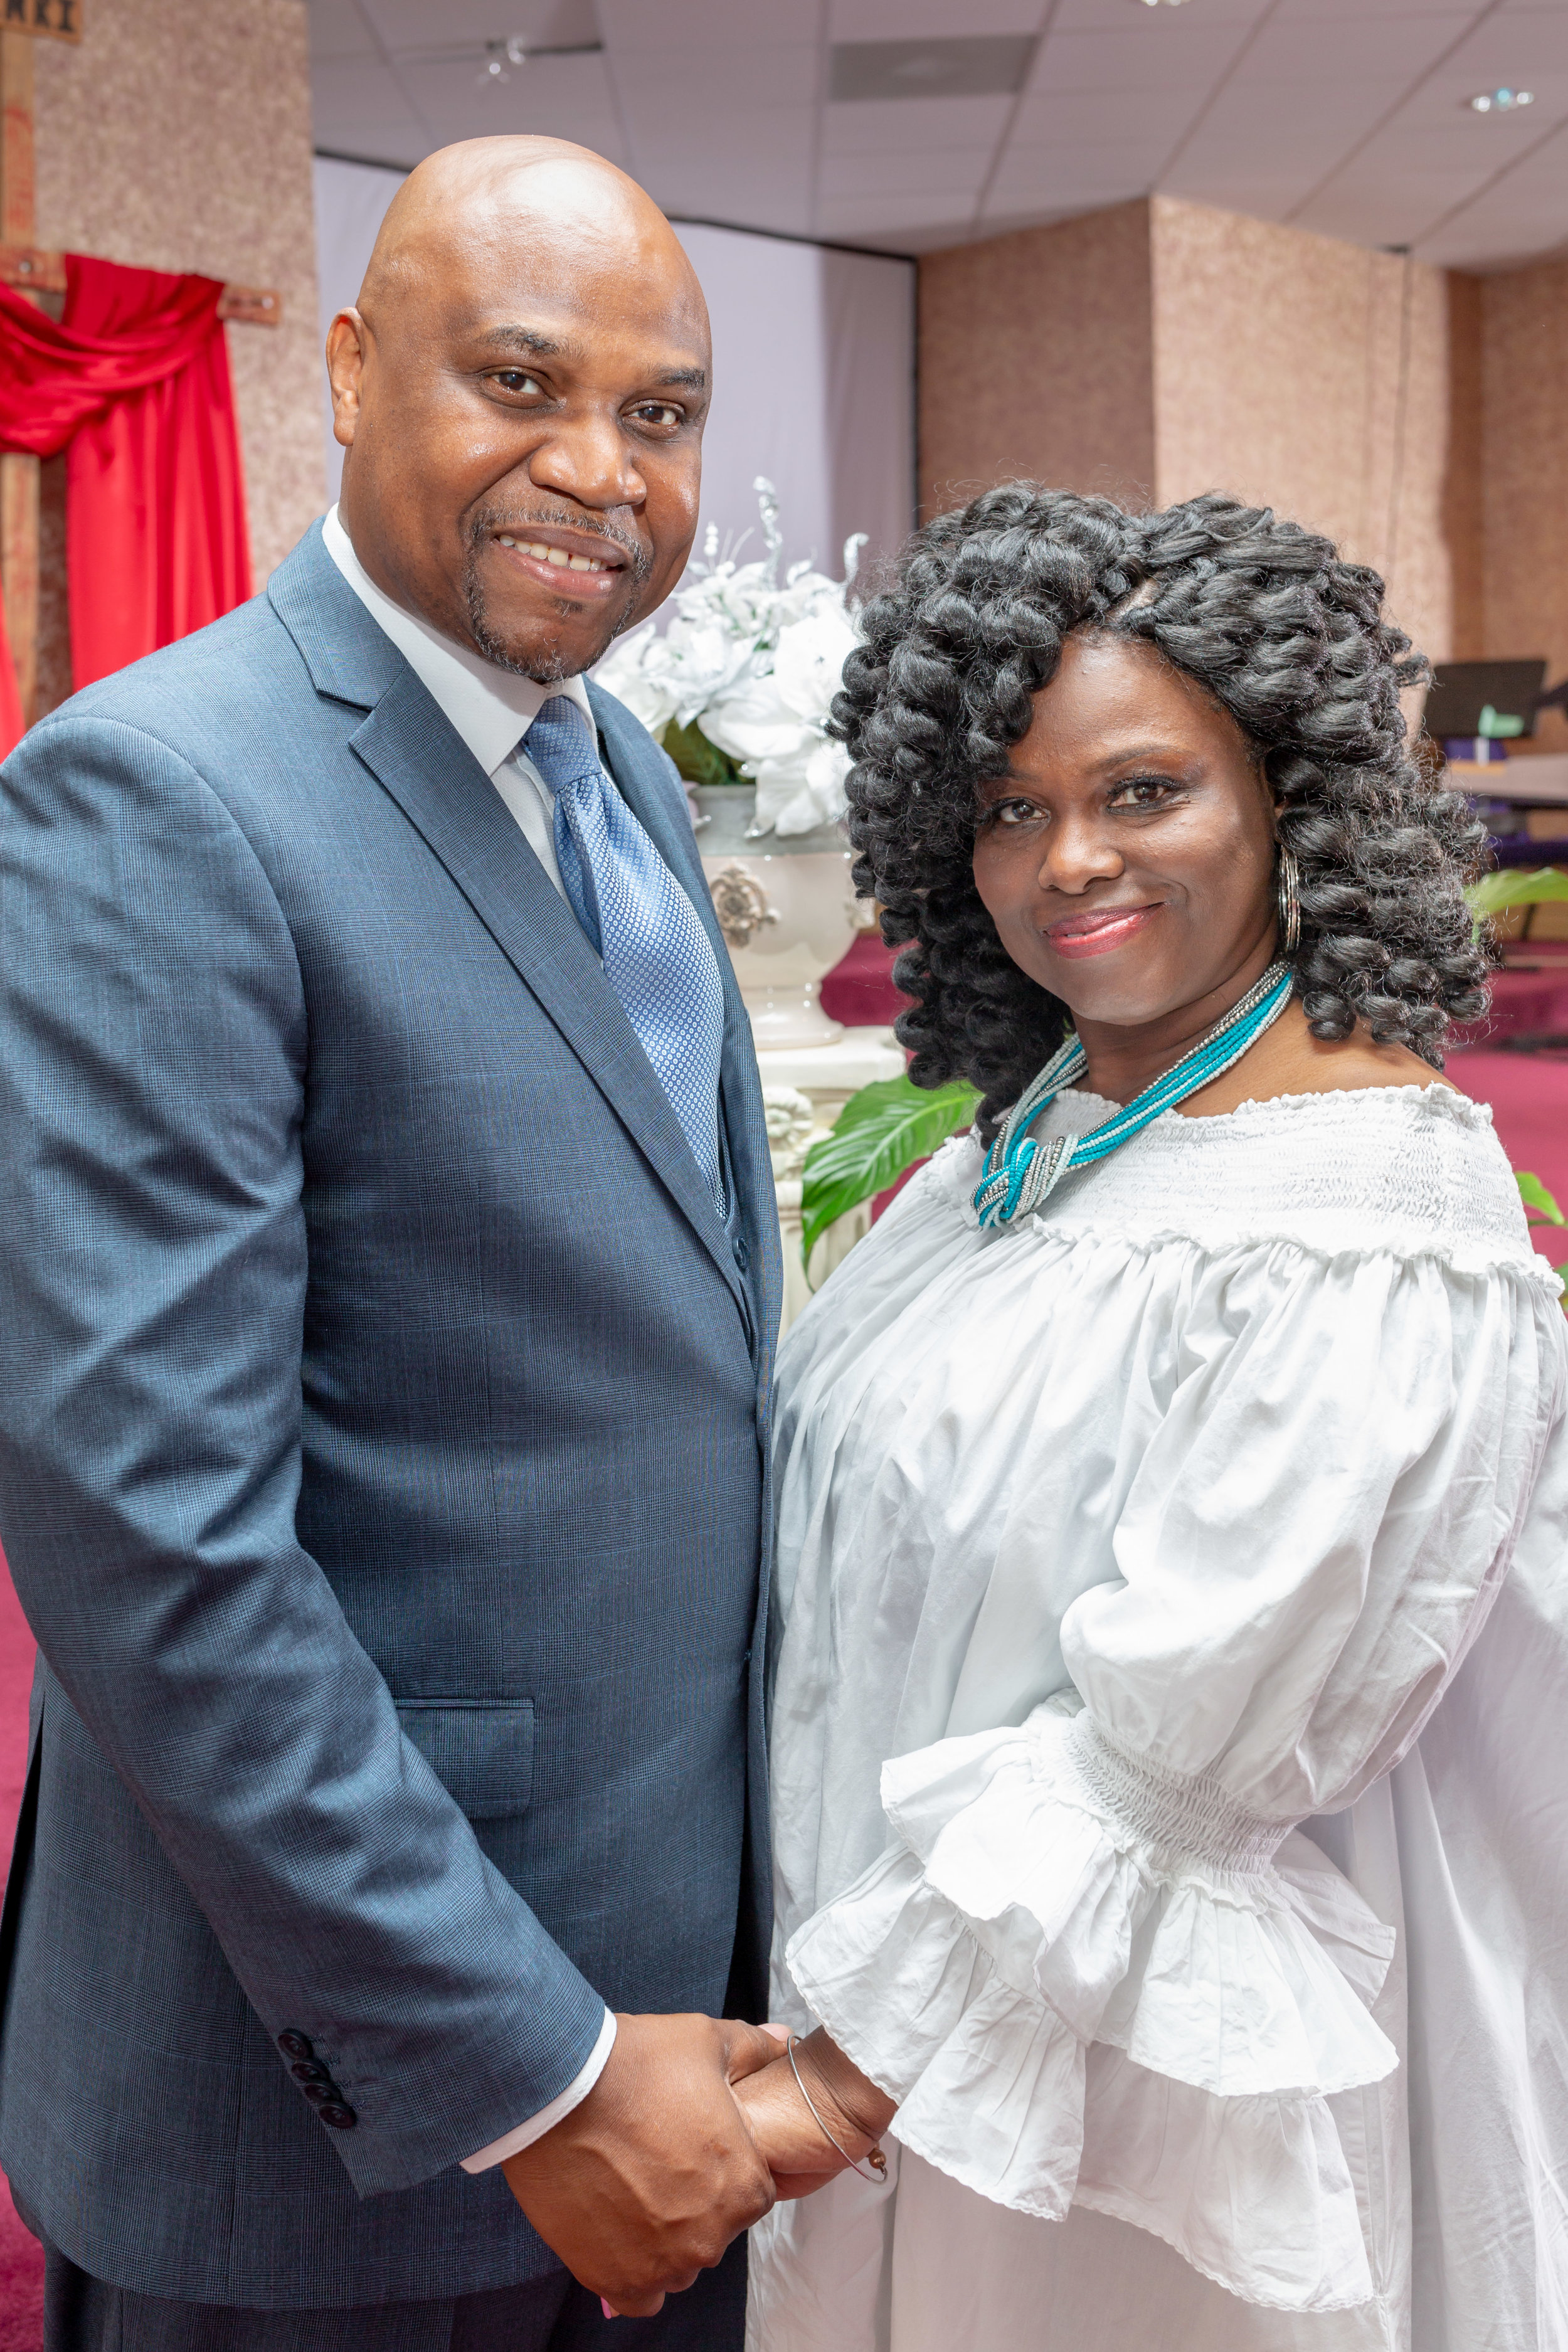 Pastor Christopher & Lady Dandra Wetherspoon, Kings Dominion Intl' Min.